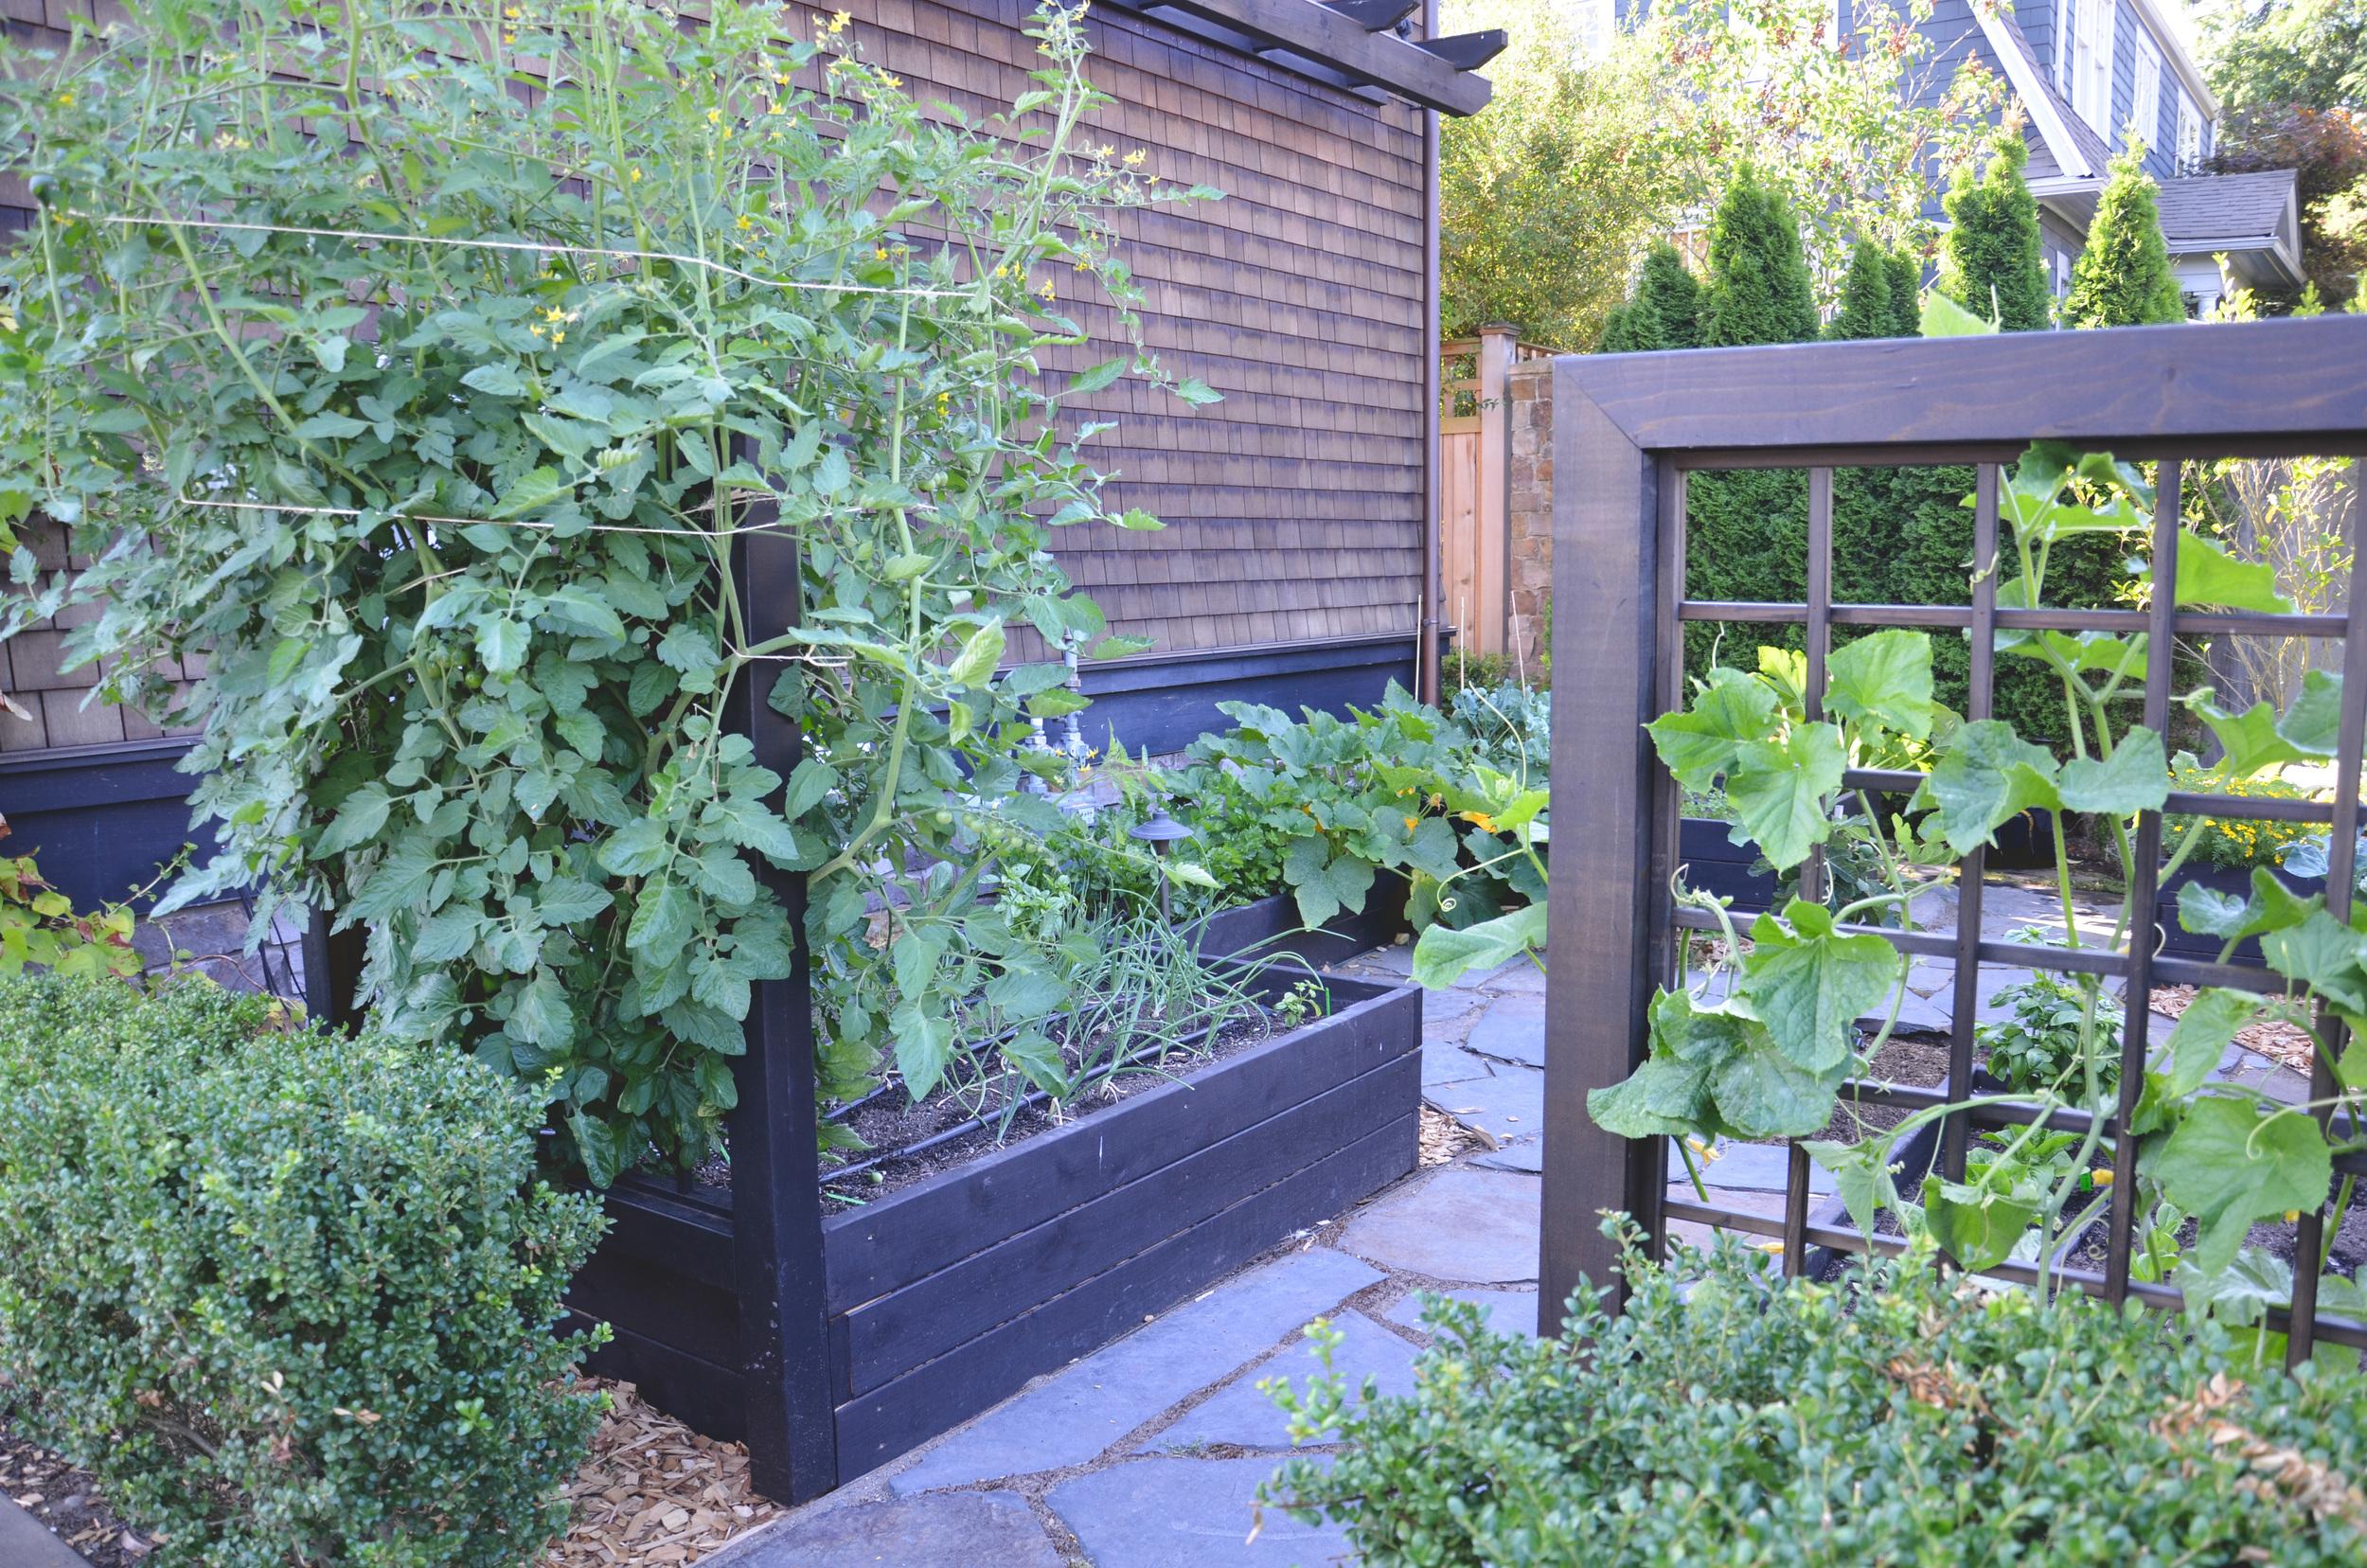 Kitchen Garden Design/Build by Seattle Urban Farm Company